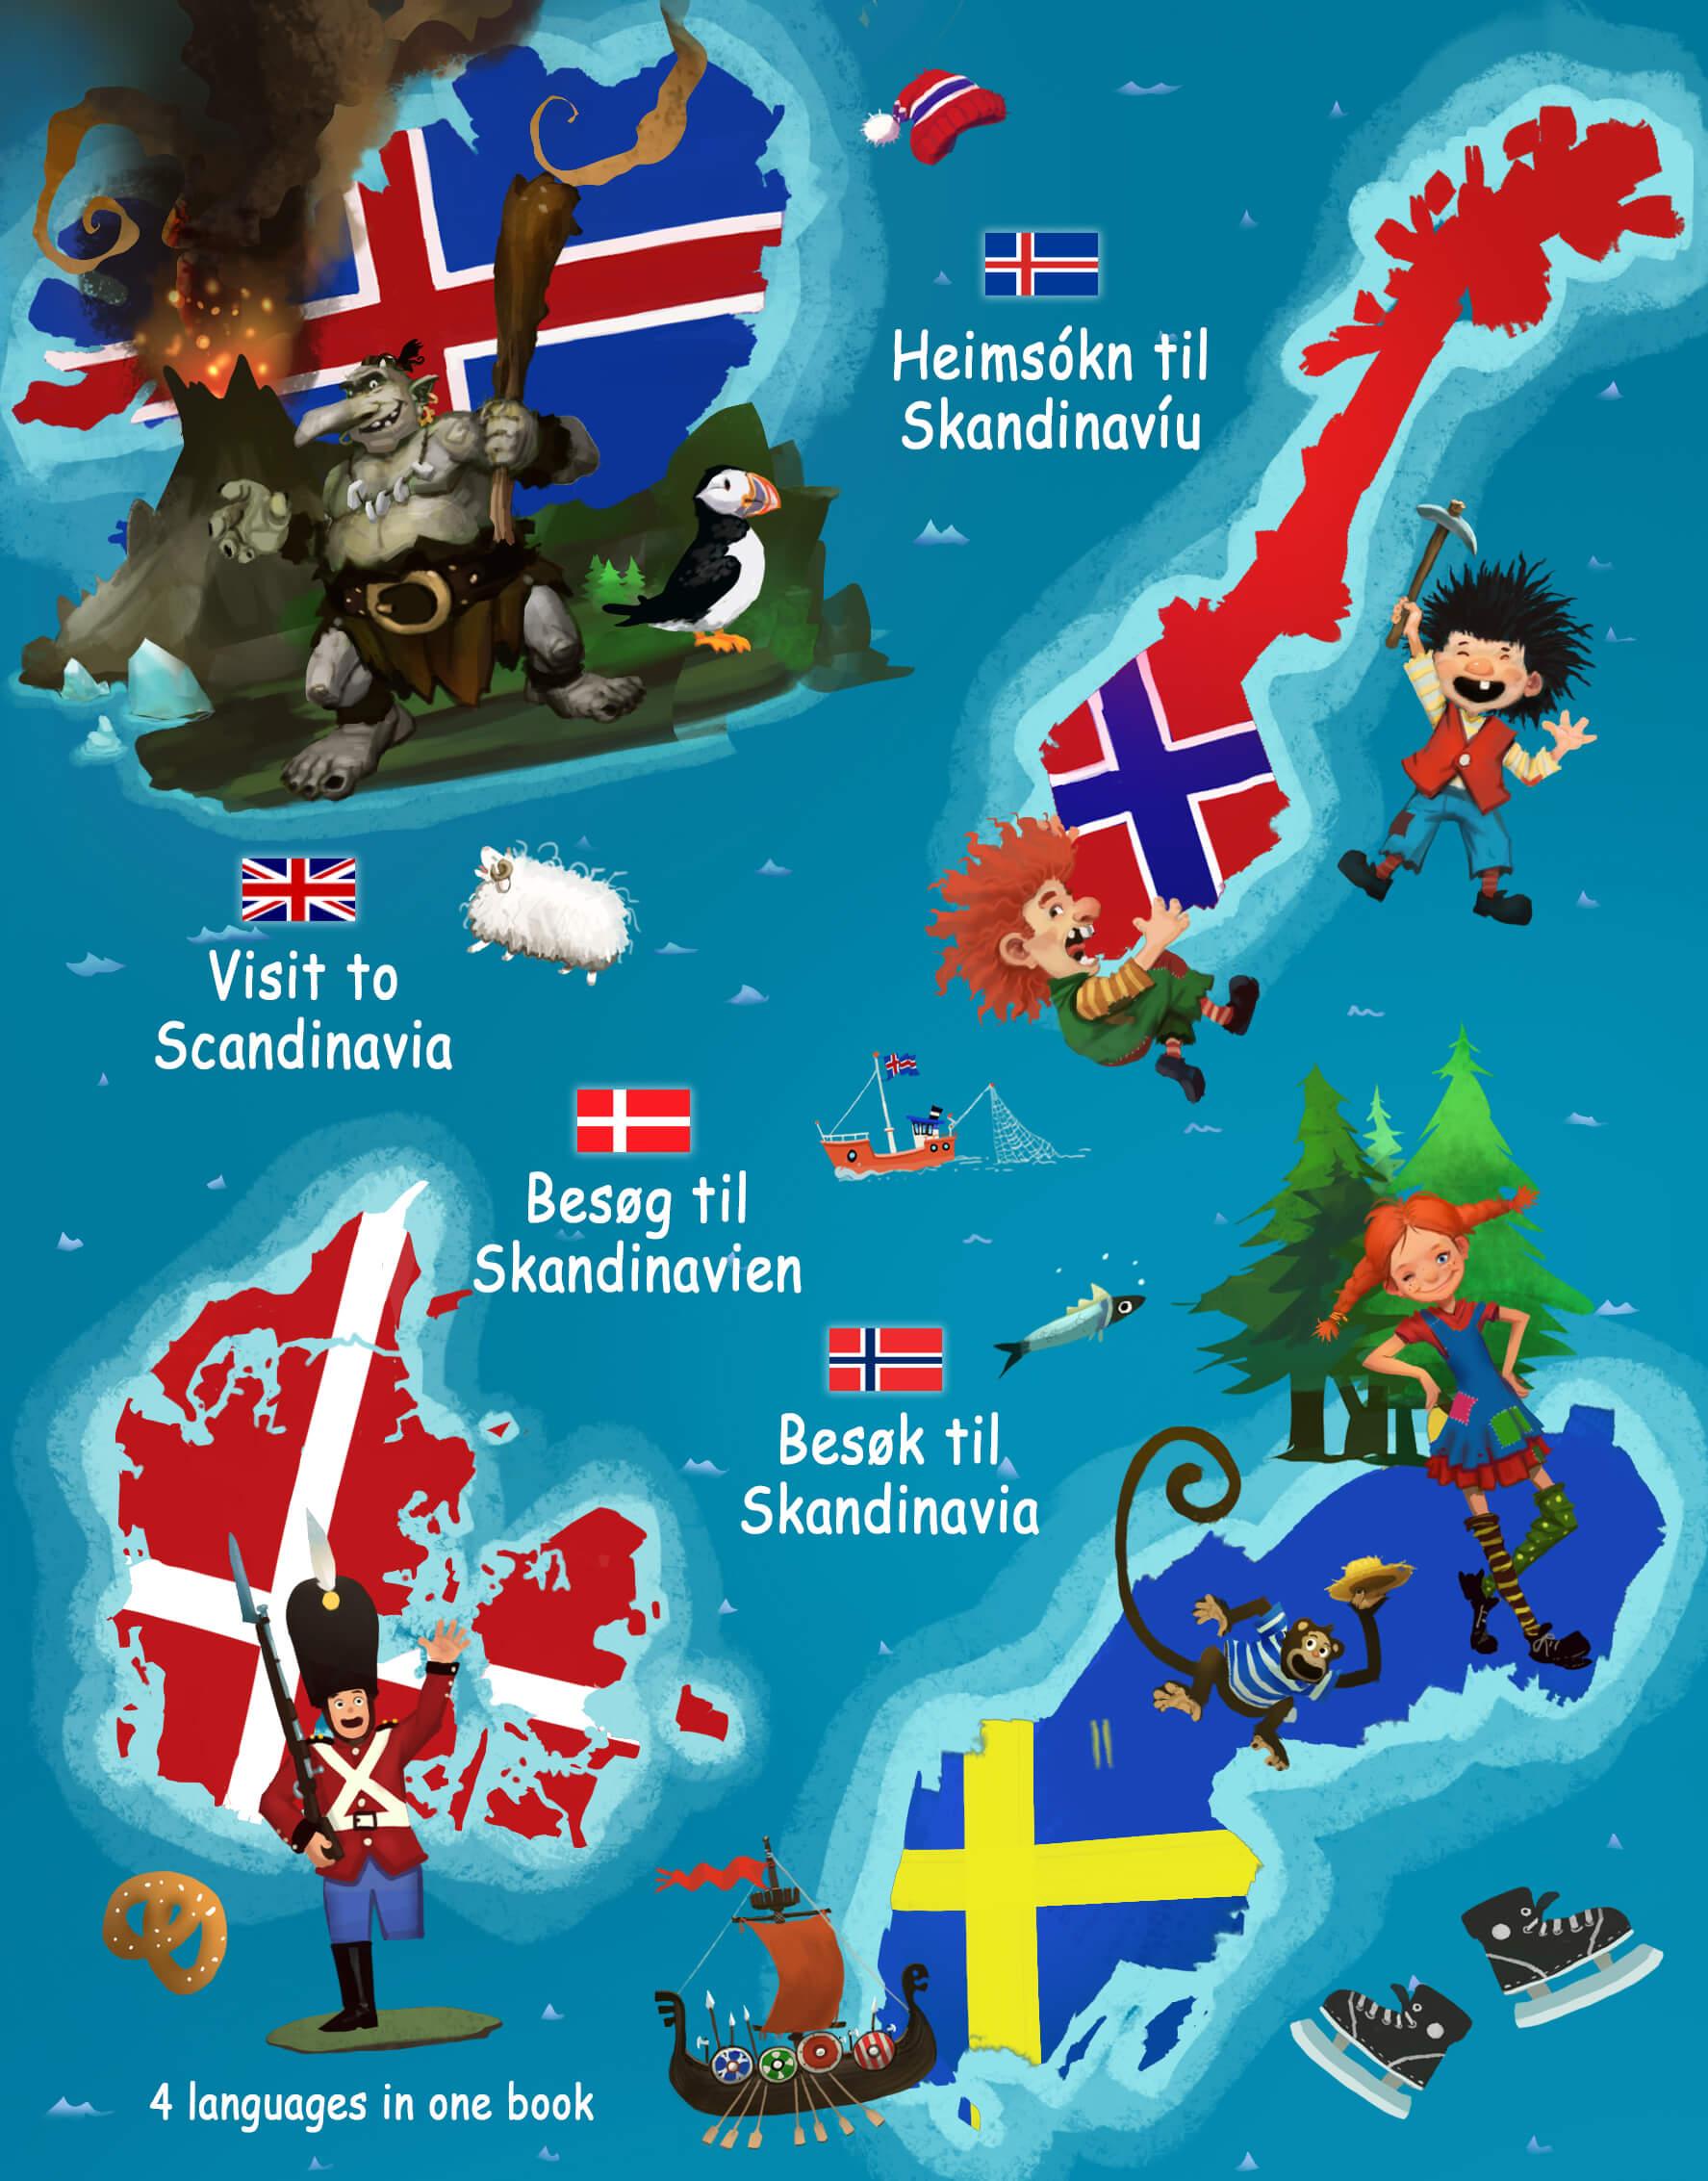 Heimsokn til Skandinaviu